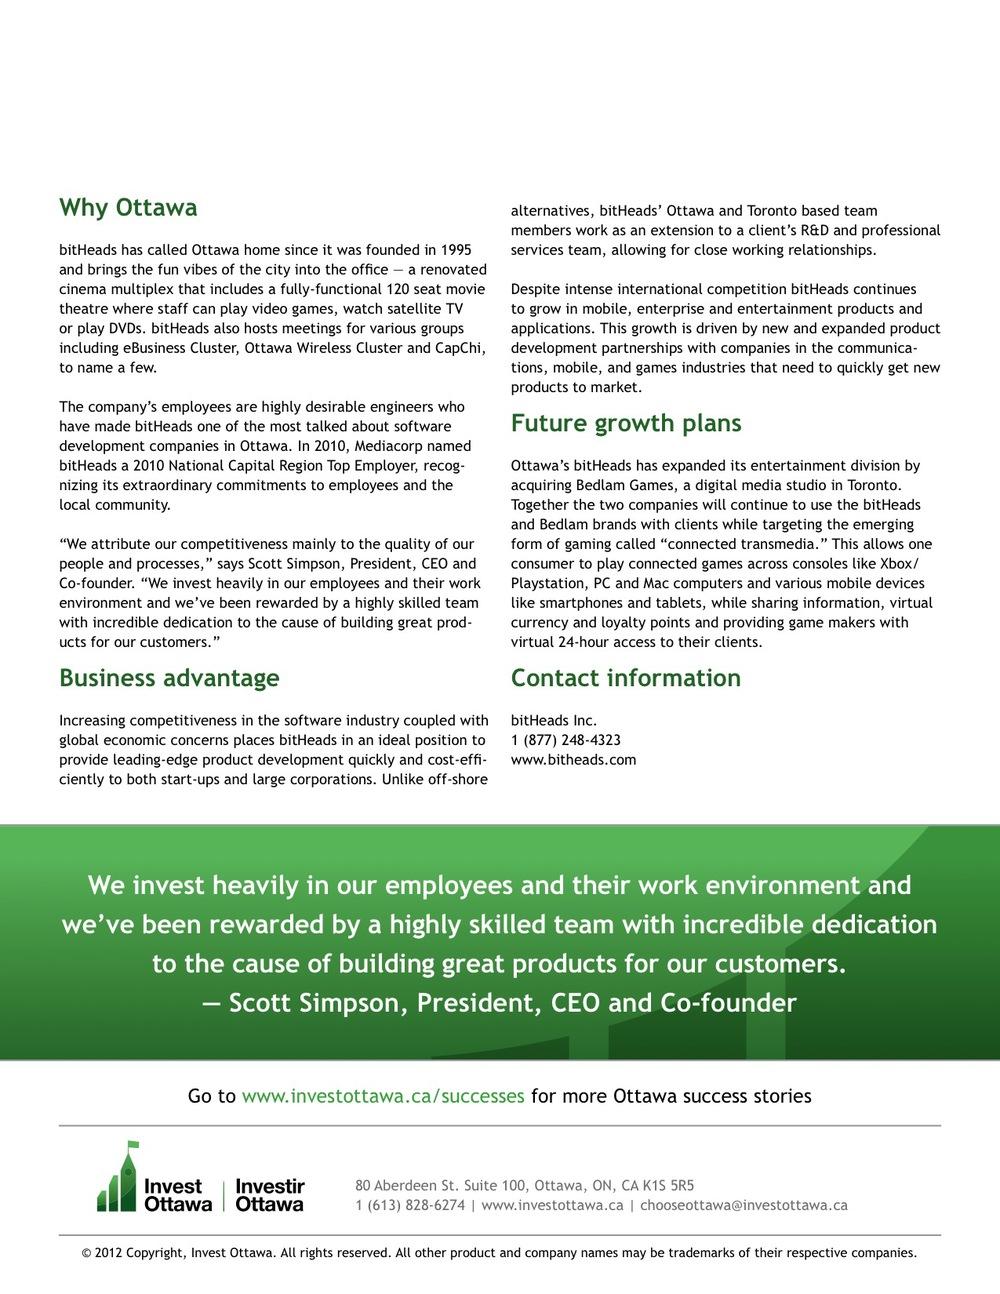 InvestOttawa-BitHeads-VIEW-page2.jpg